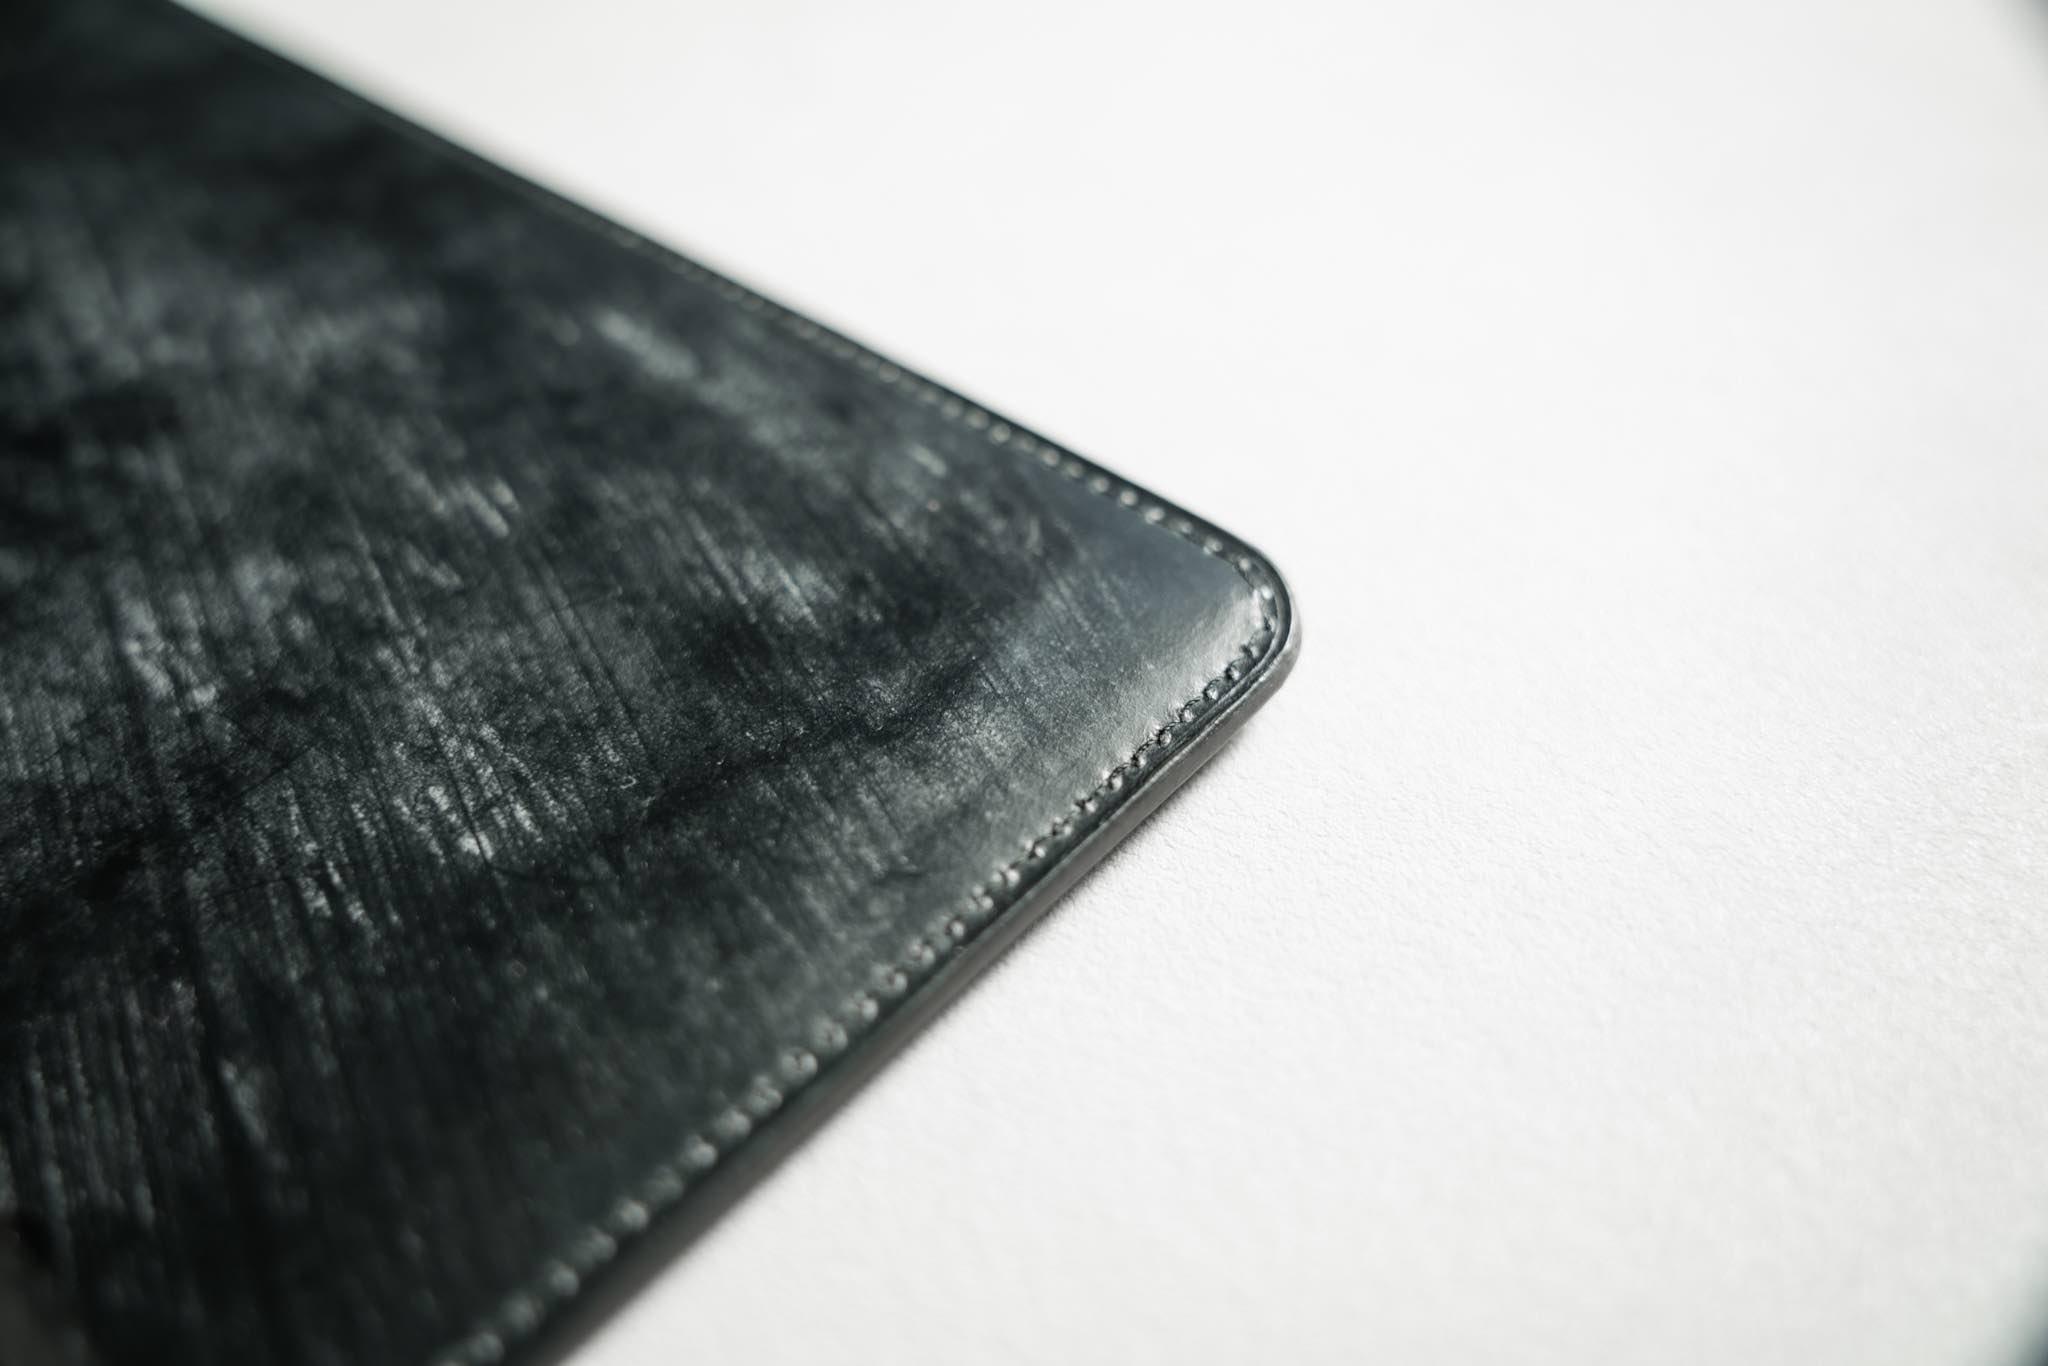 crafsto(クラフスト) MacBook用スリーブケース|強度:毎日使える安心の設計